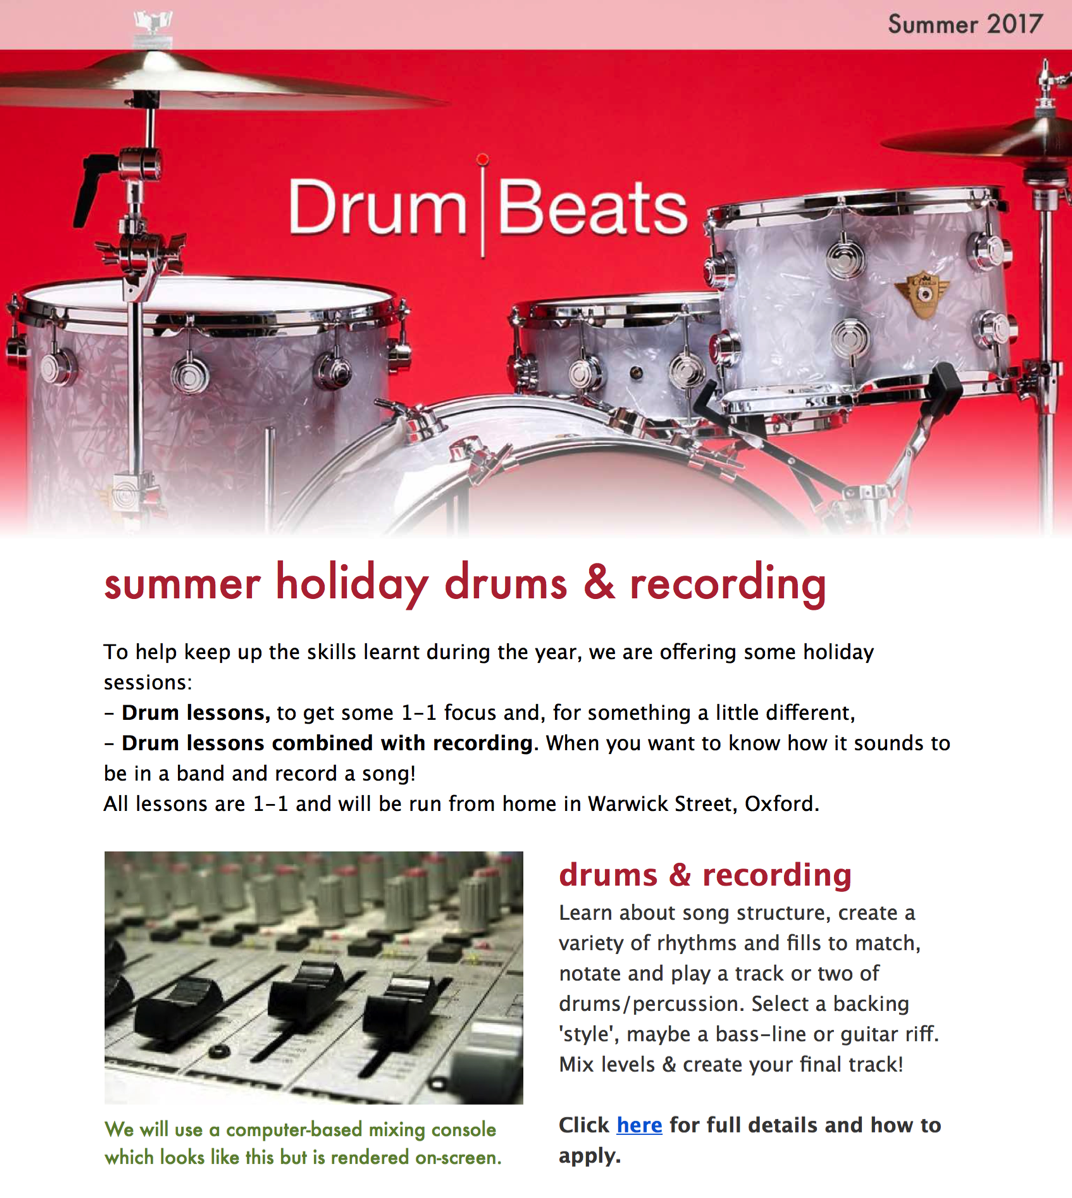 DrumBeats Home